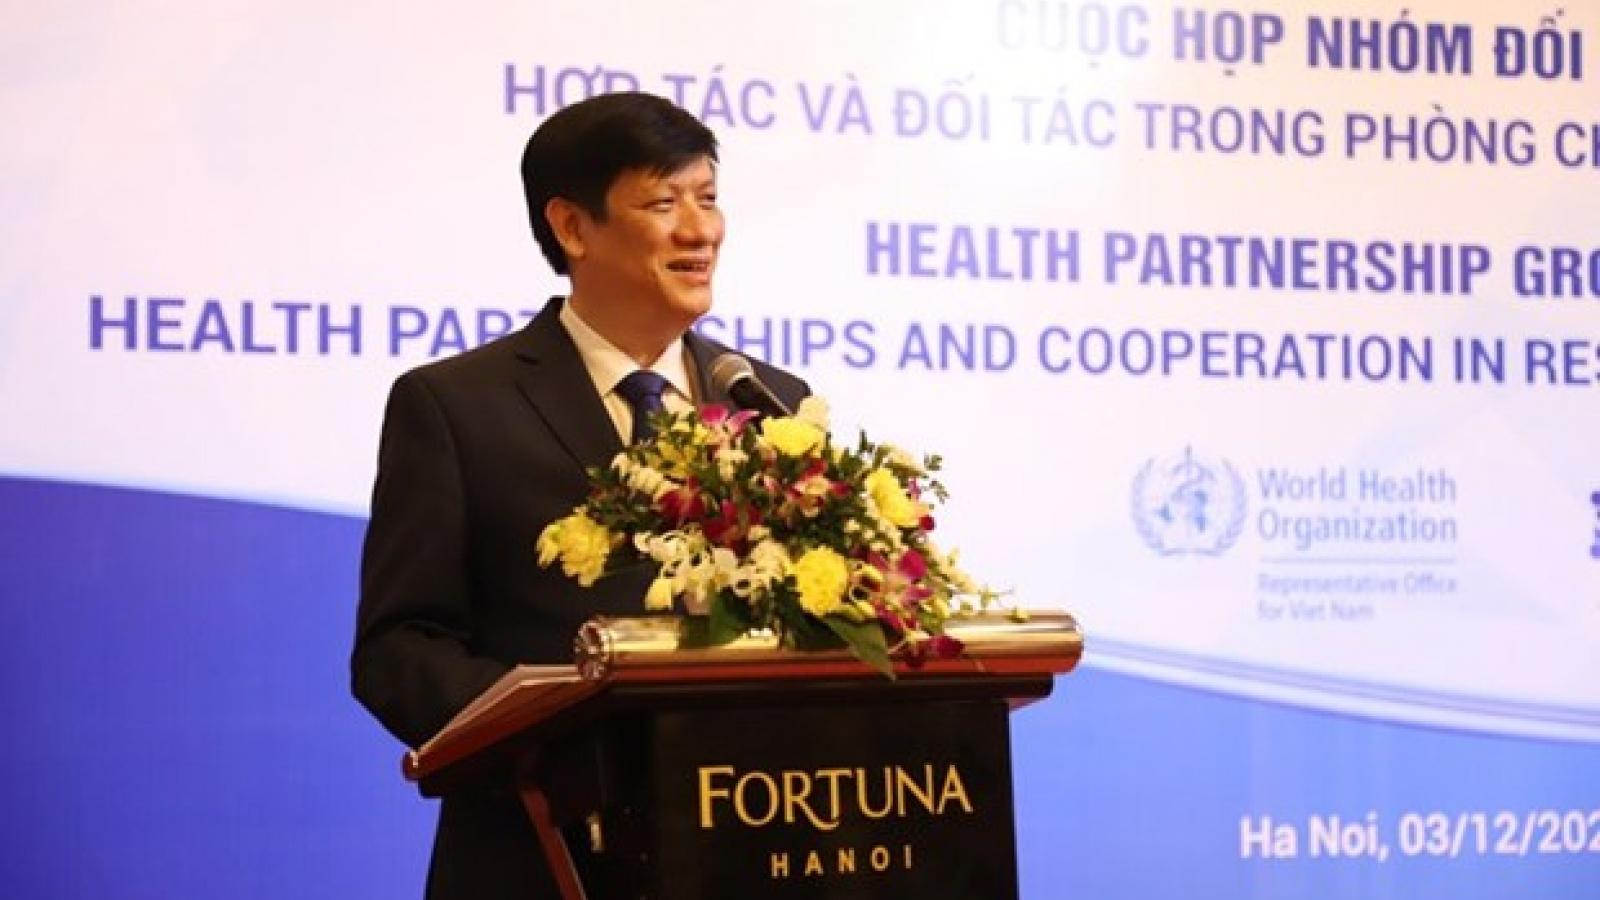 Vietnam bolsters health partnerships to tackle COVID-19